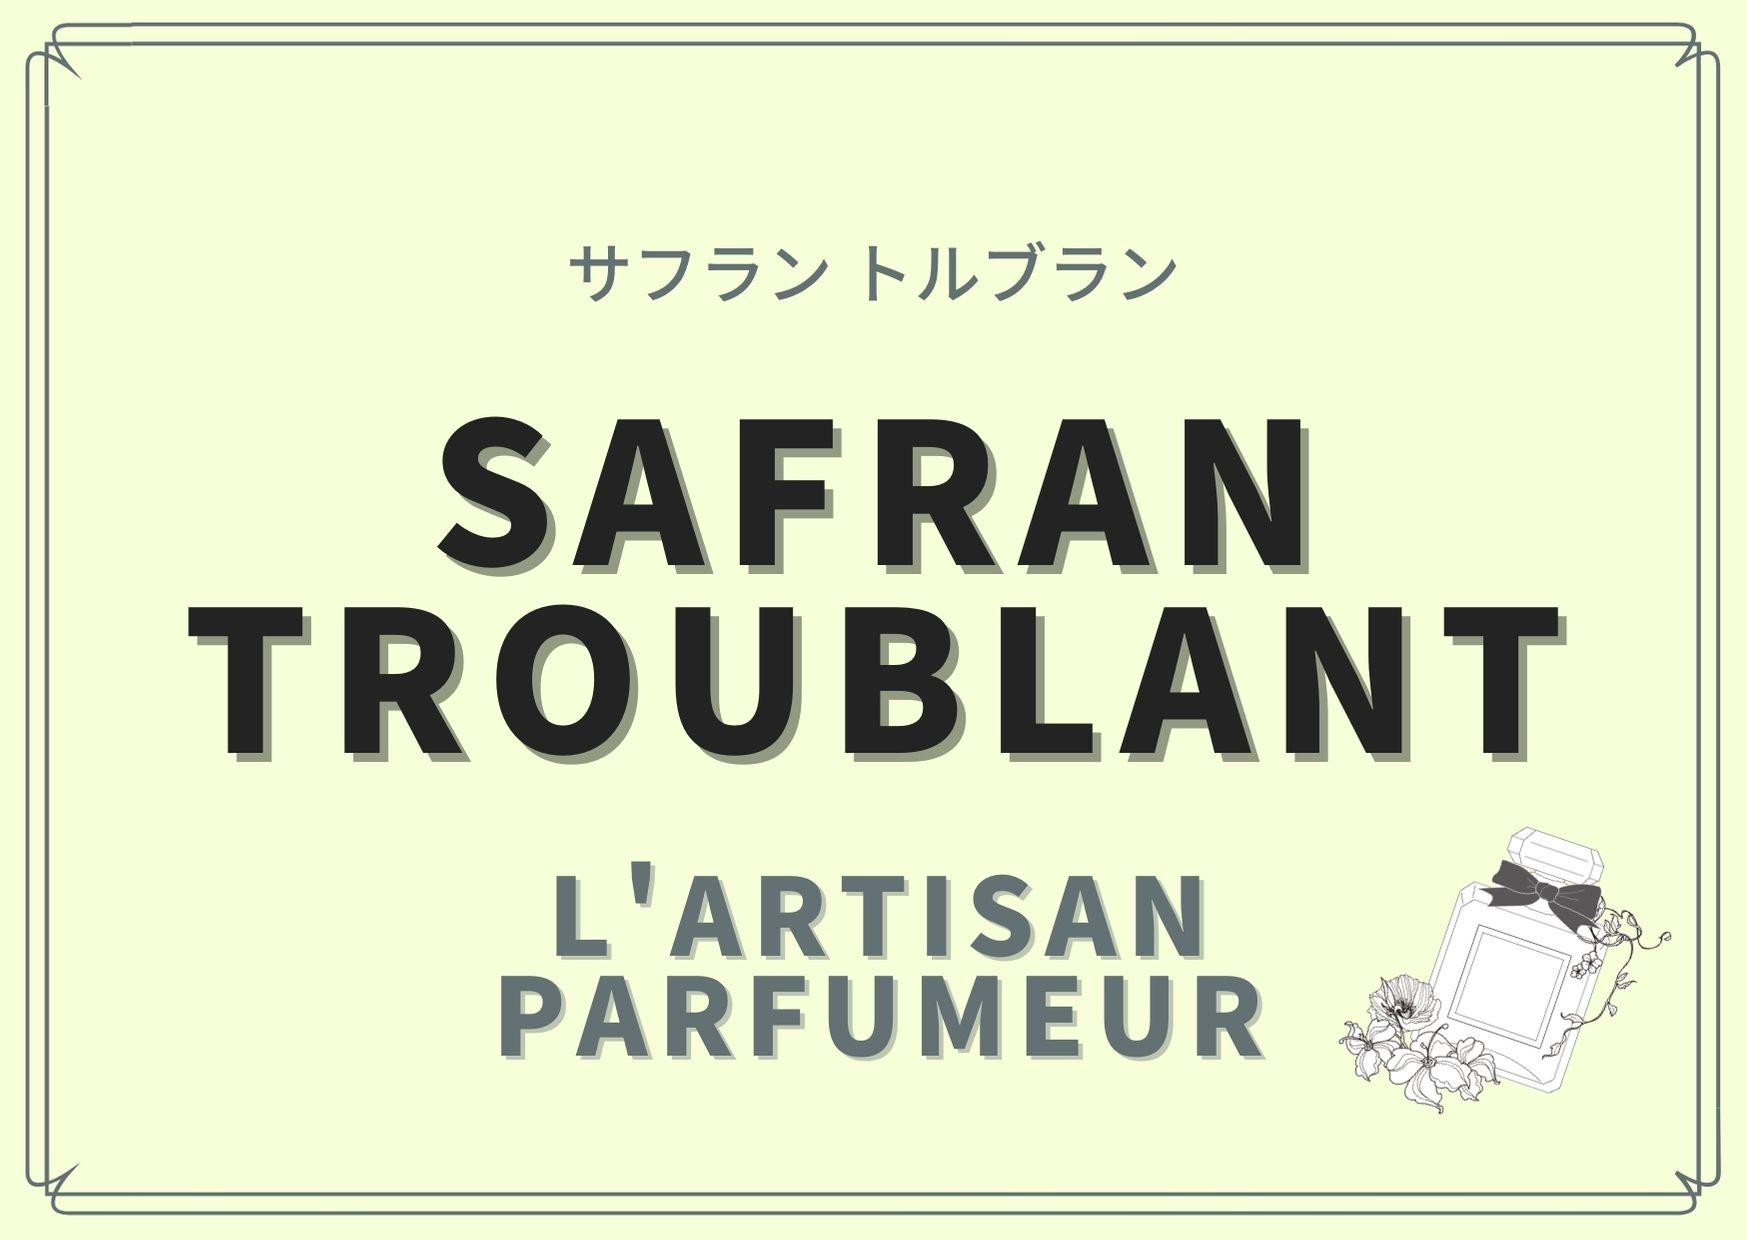 SAFRAN TROUBLANT(サフラン トルブラン)/L'ARTISAN PARFUMEUR(ラルチザン パフューム)